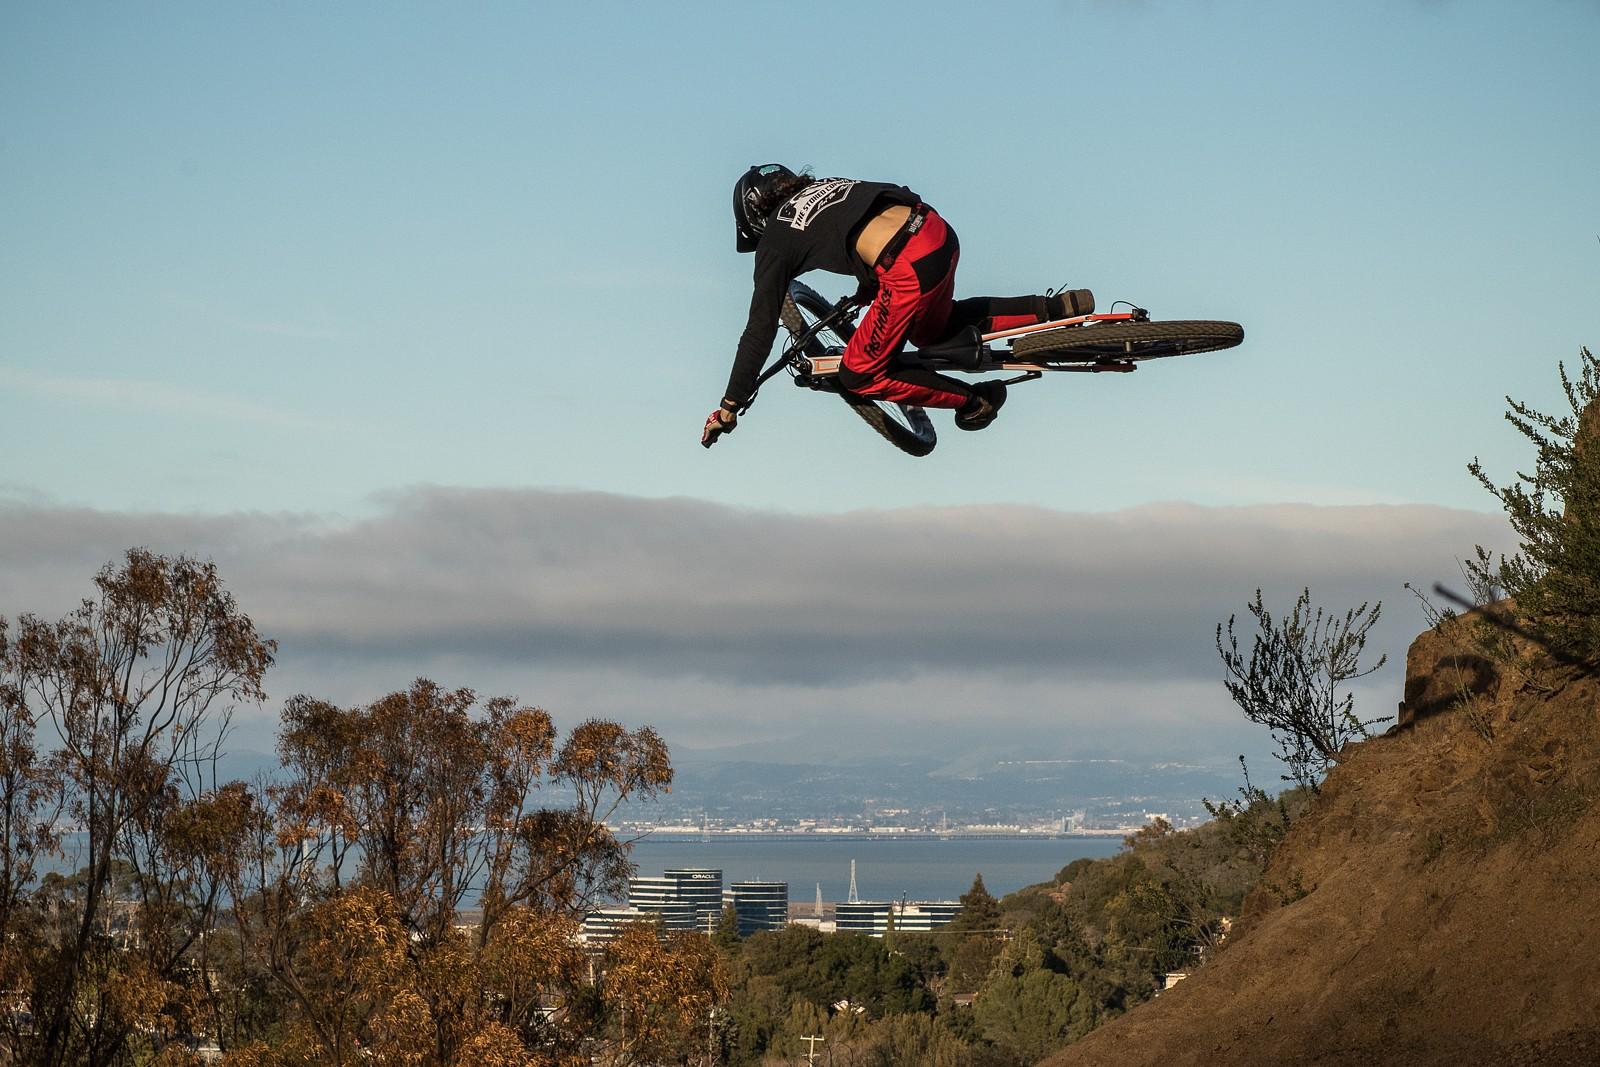 Paul Jackson - danseverson photo - Mountain Biking Pictures - Vital MTB